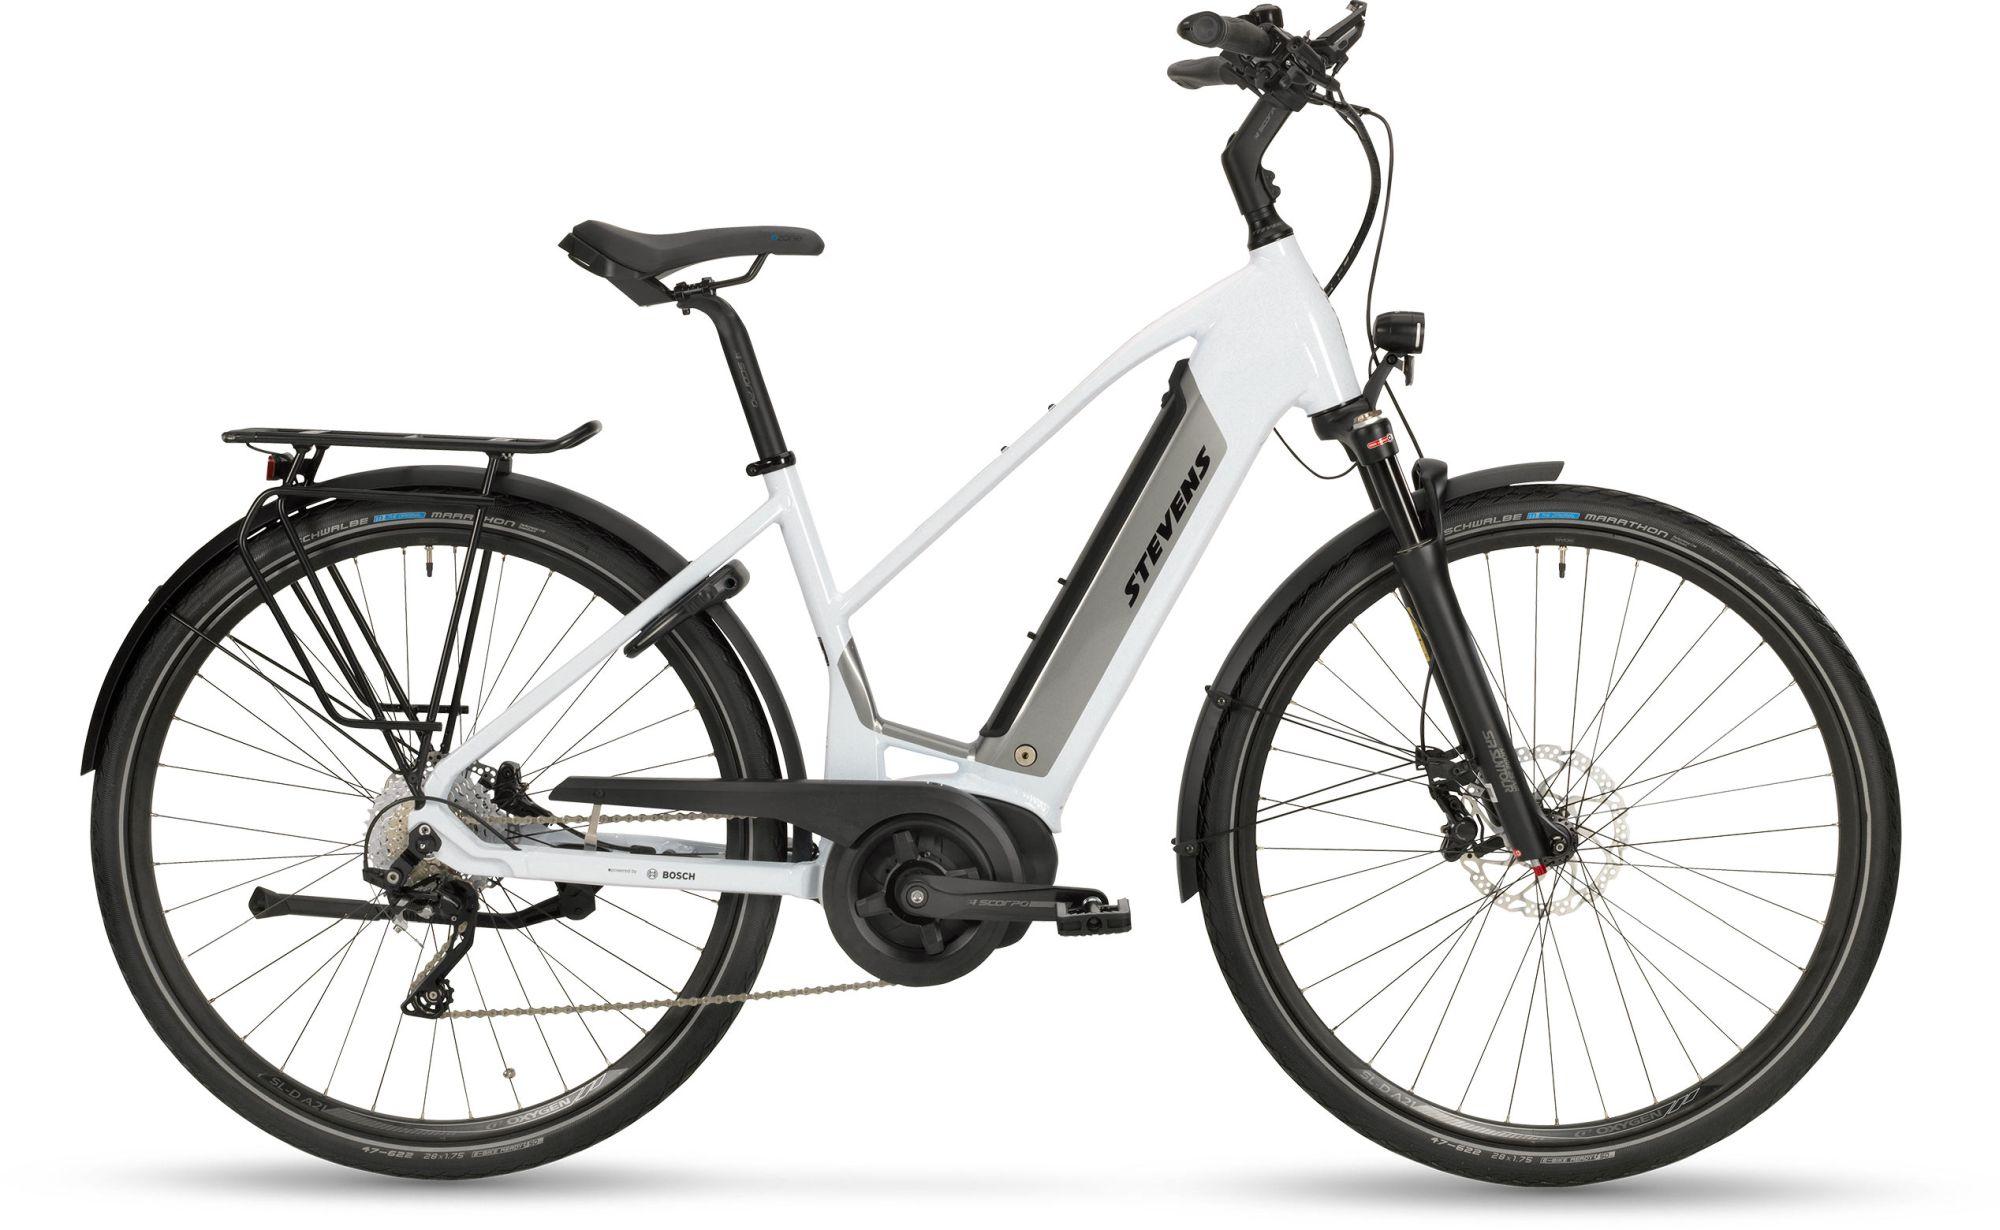 E-Bikes: STEVENS  E-TRITON PT5 Damenfahrrad Trapez Modell 2020 28 Zoll 54 cm